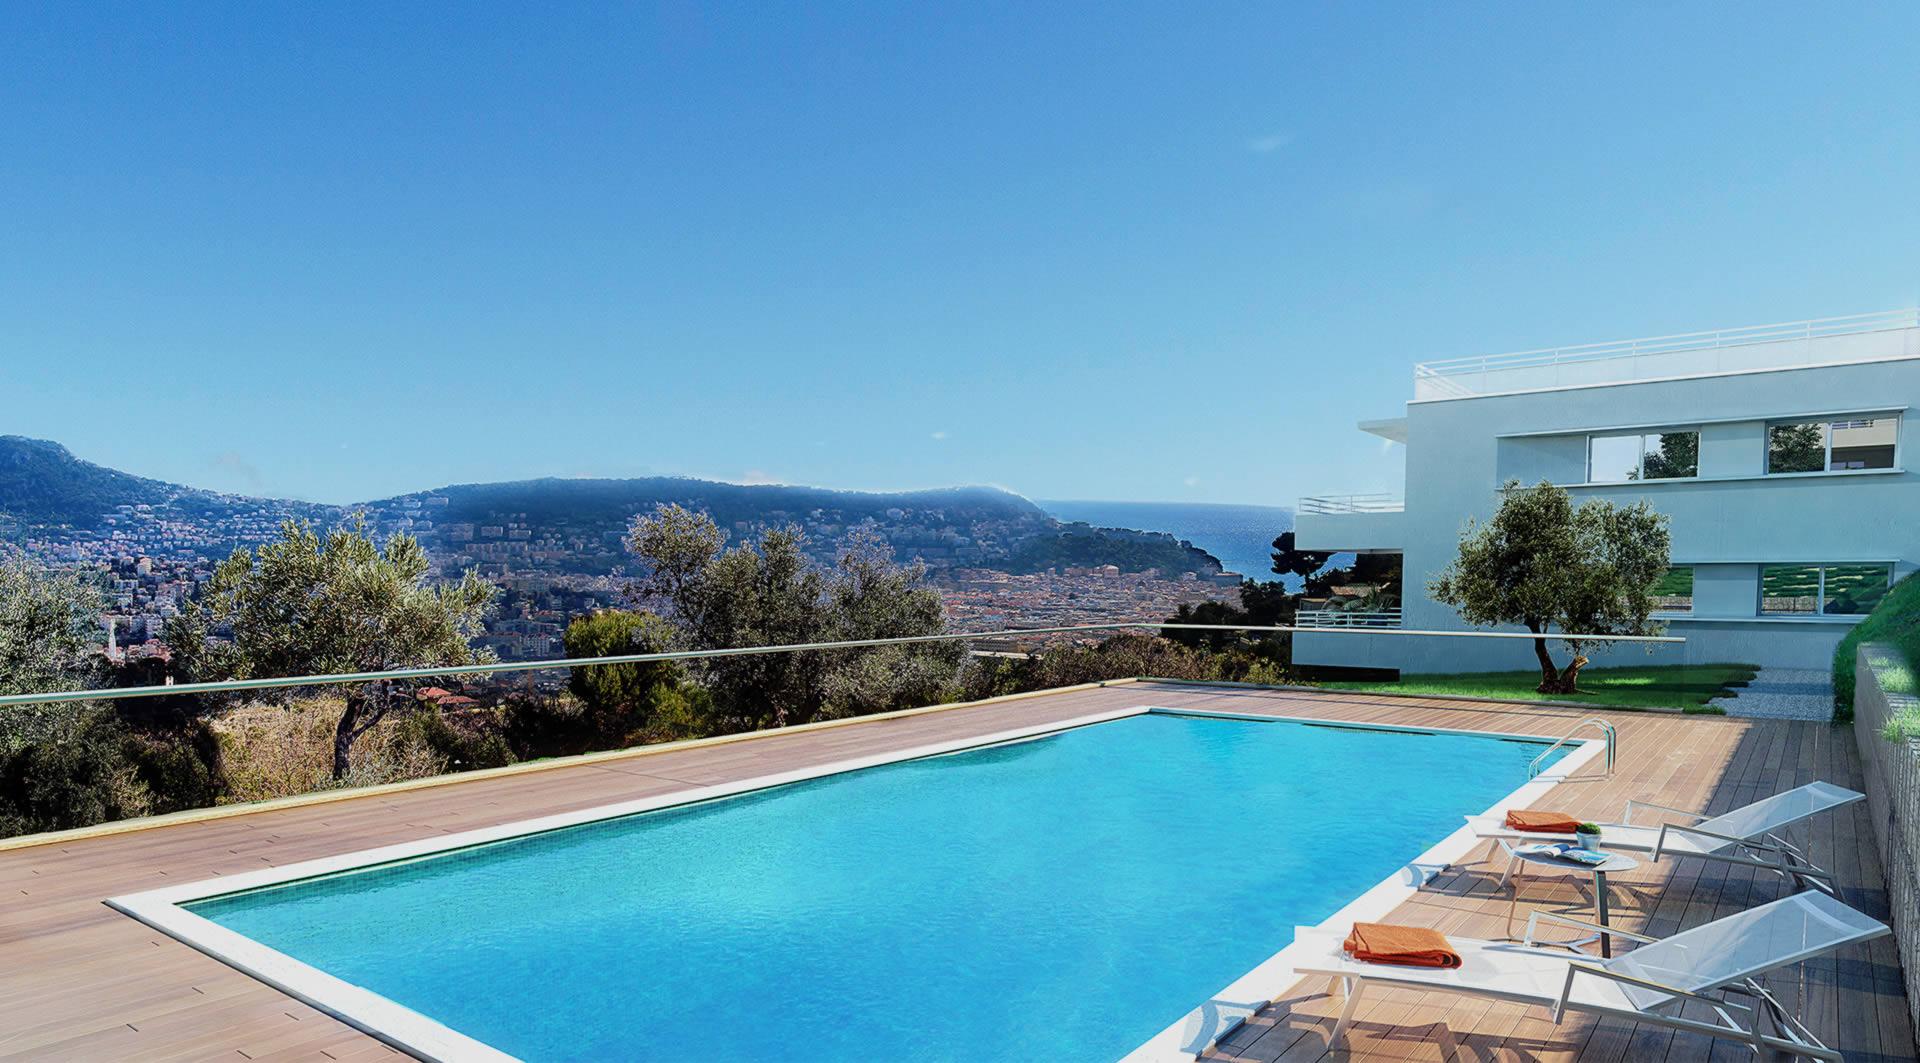 Immobilier neuf à Nice et sa région